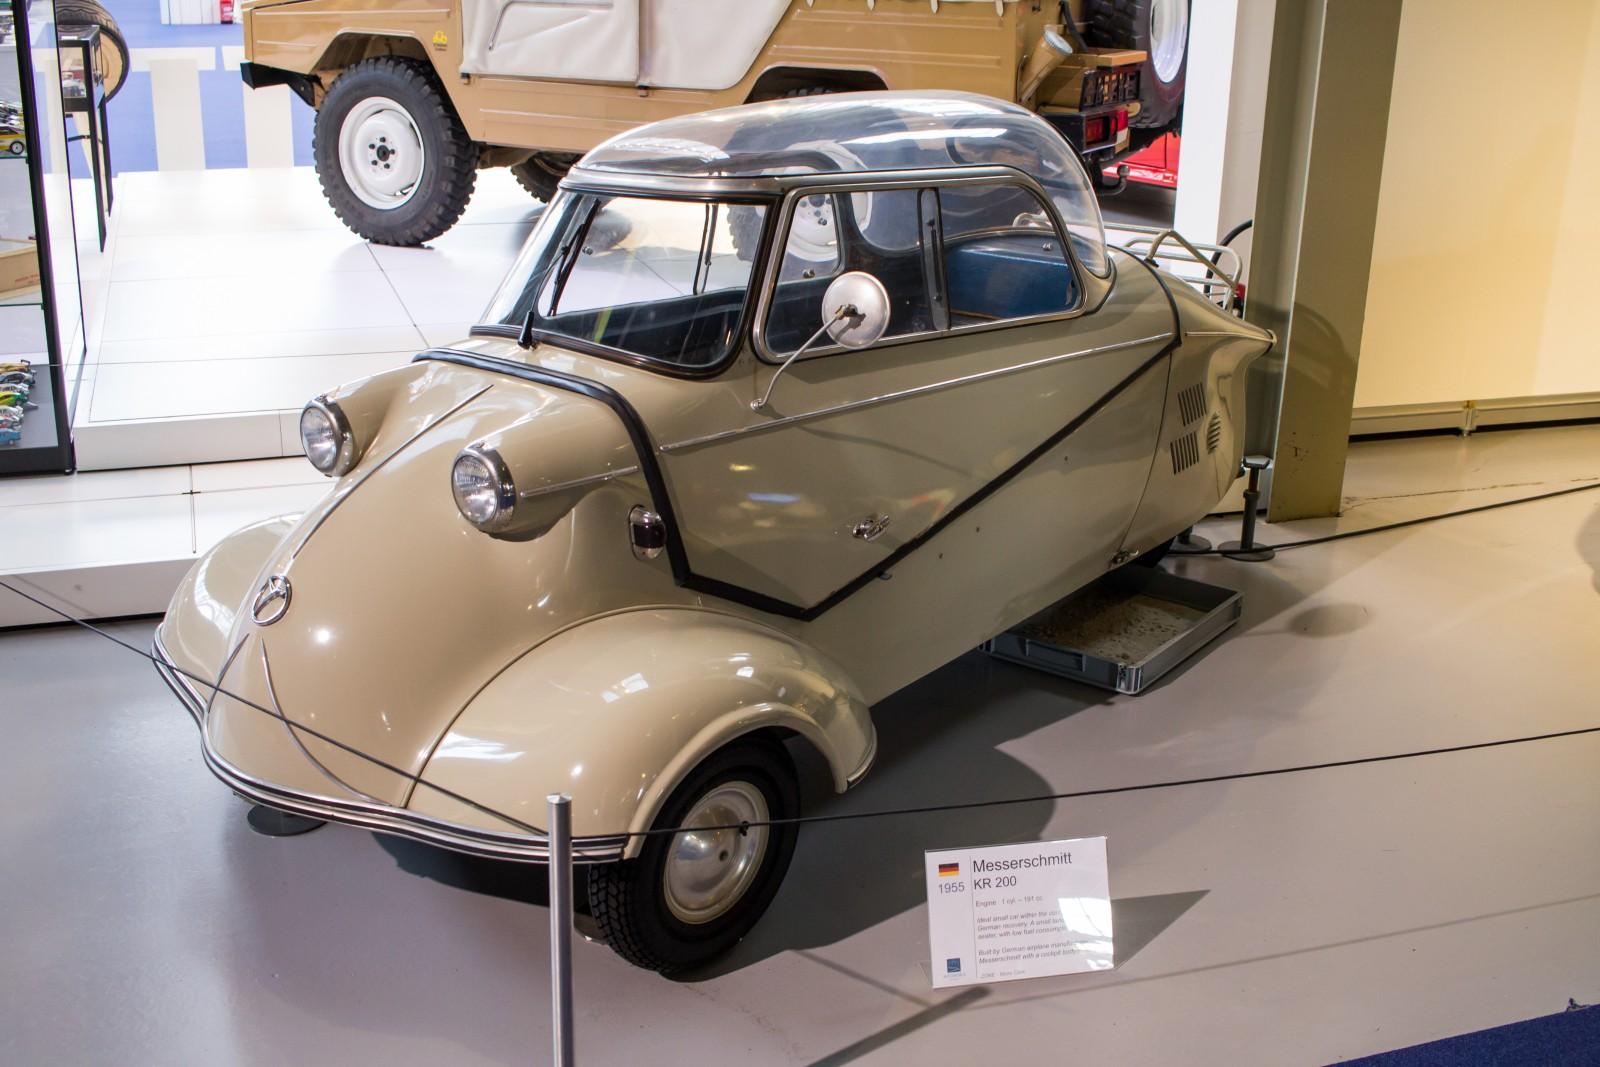 Messerschmitt KR200 on display in the Autoworld Brussels